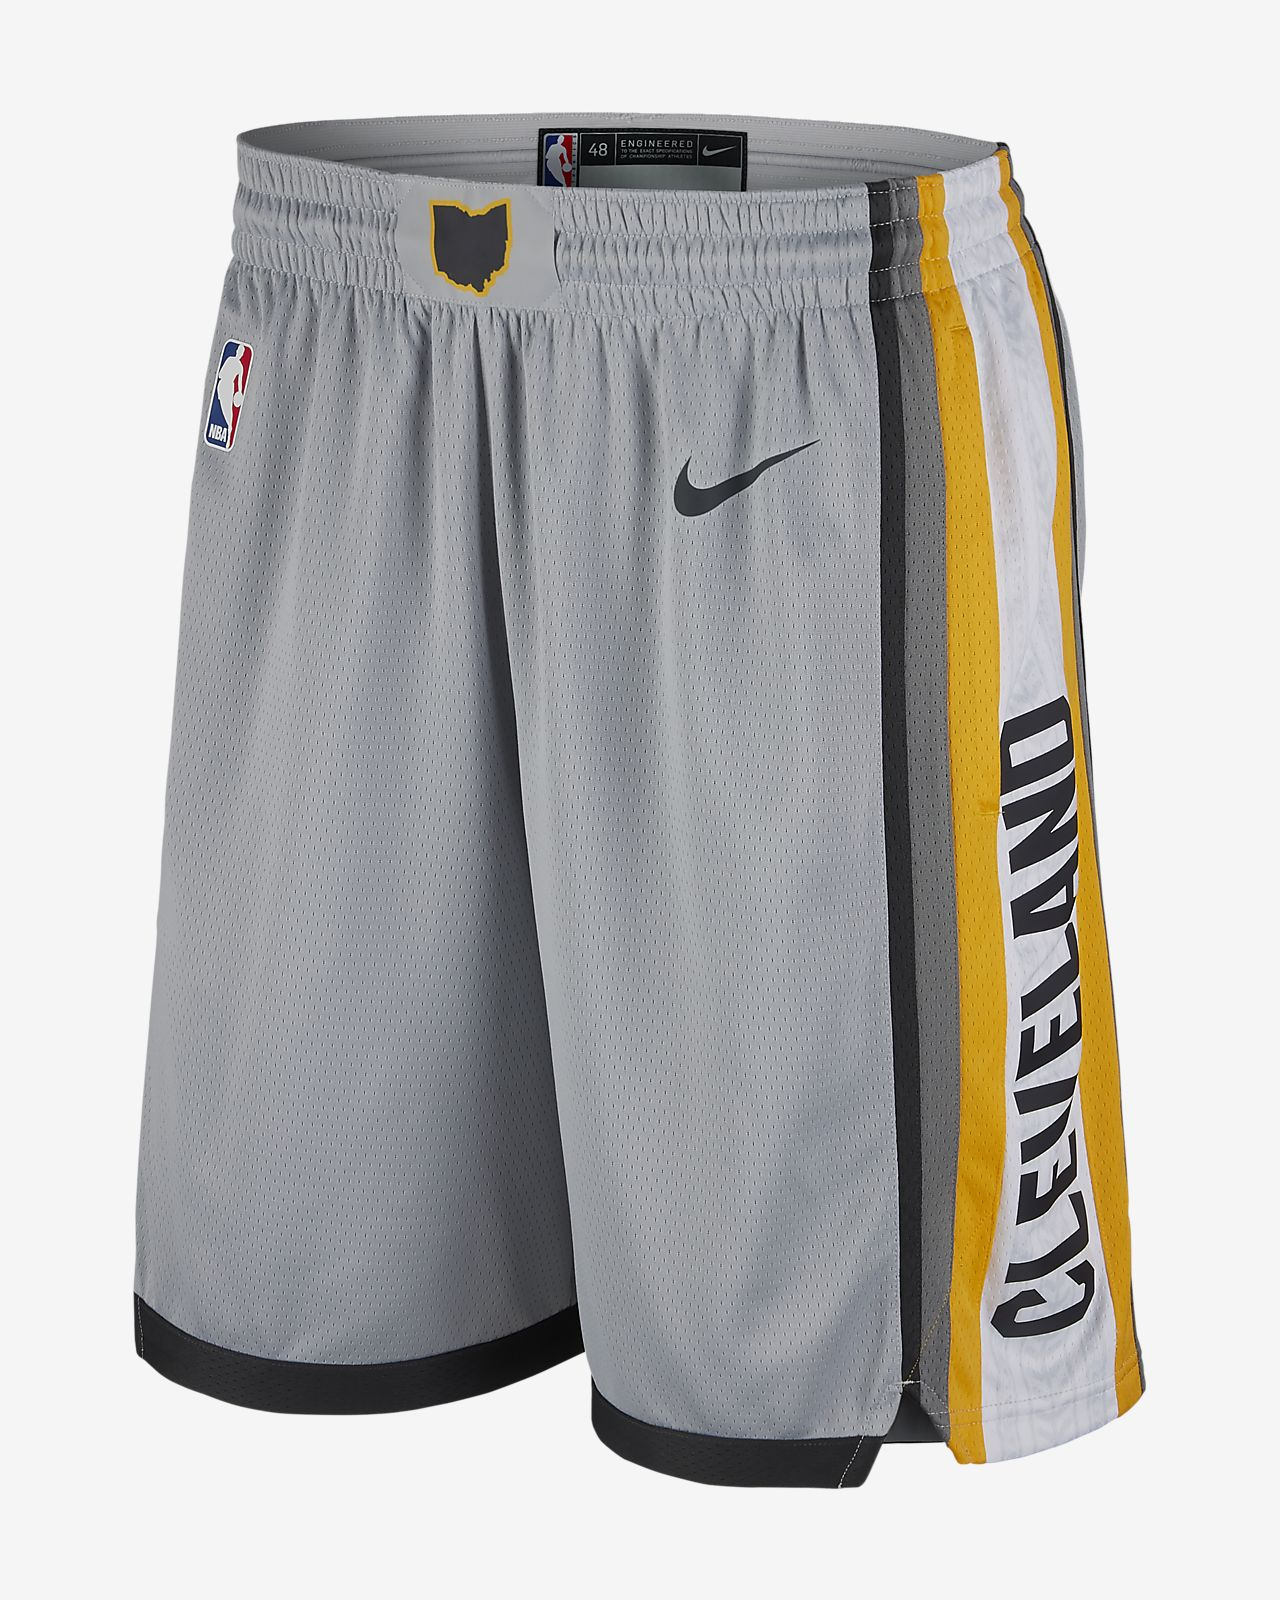 cad861355de6 Cleveland Cavaliers Nike City Edition Swingman Men s NBA Shorts ...